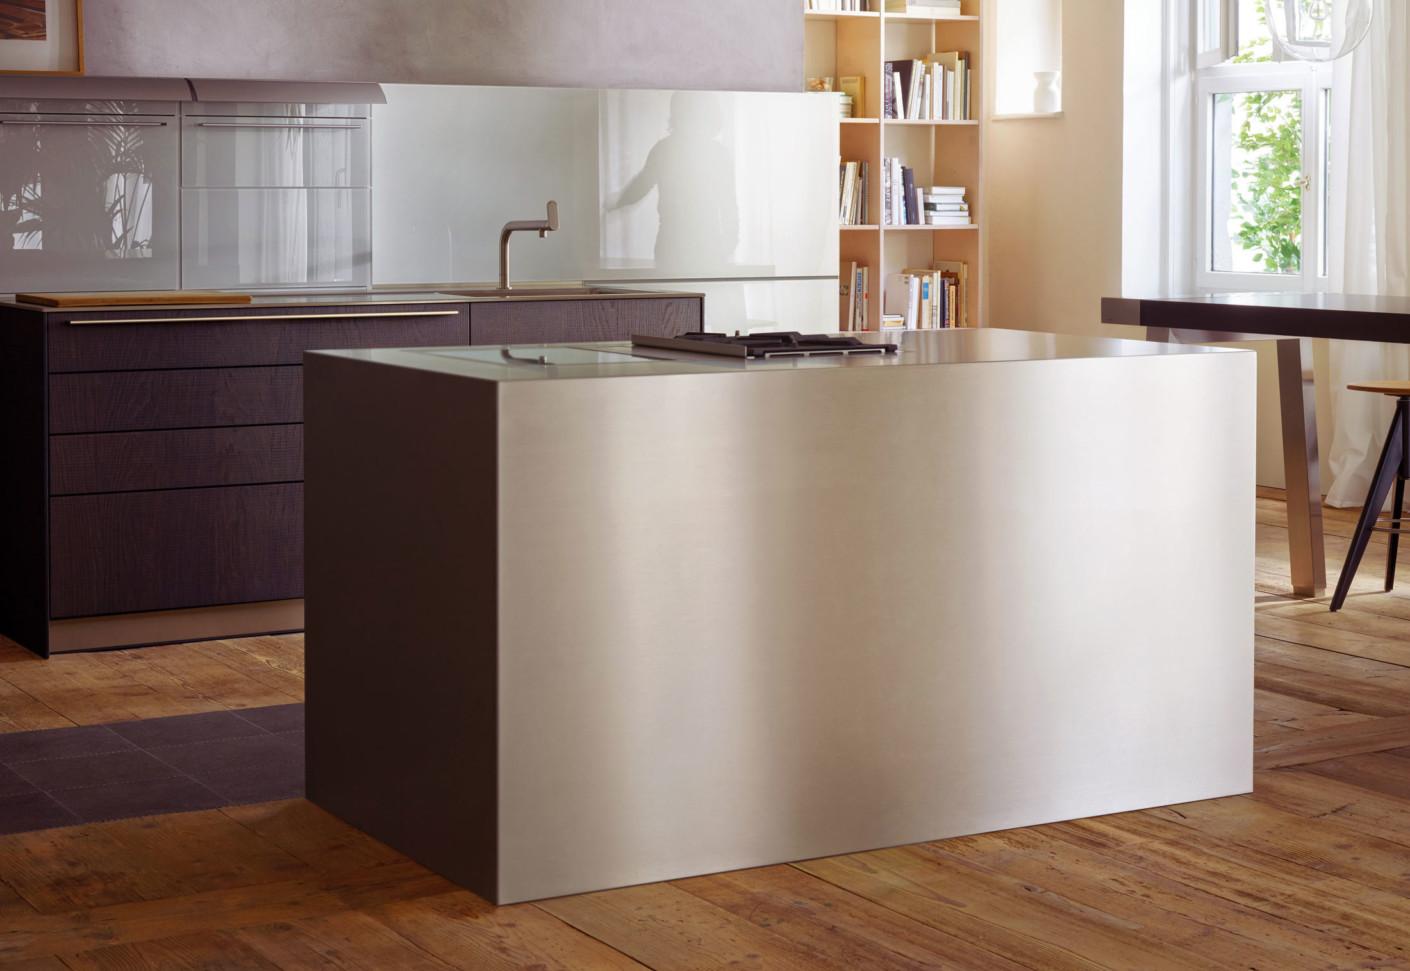 bulthaup b3 edelstahl und aluminium von bulthaup stylepark. Black Bedroom Furniture Sets. Home Design Ideas